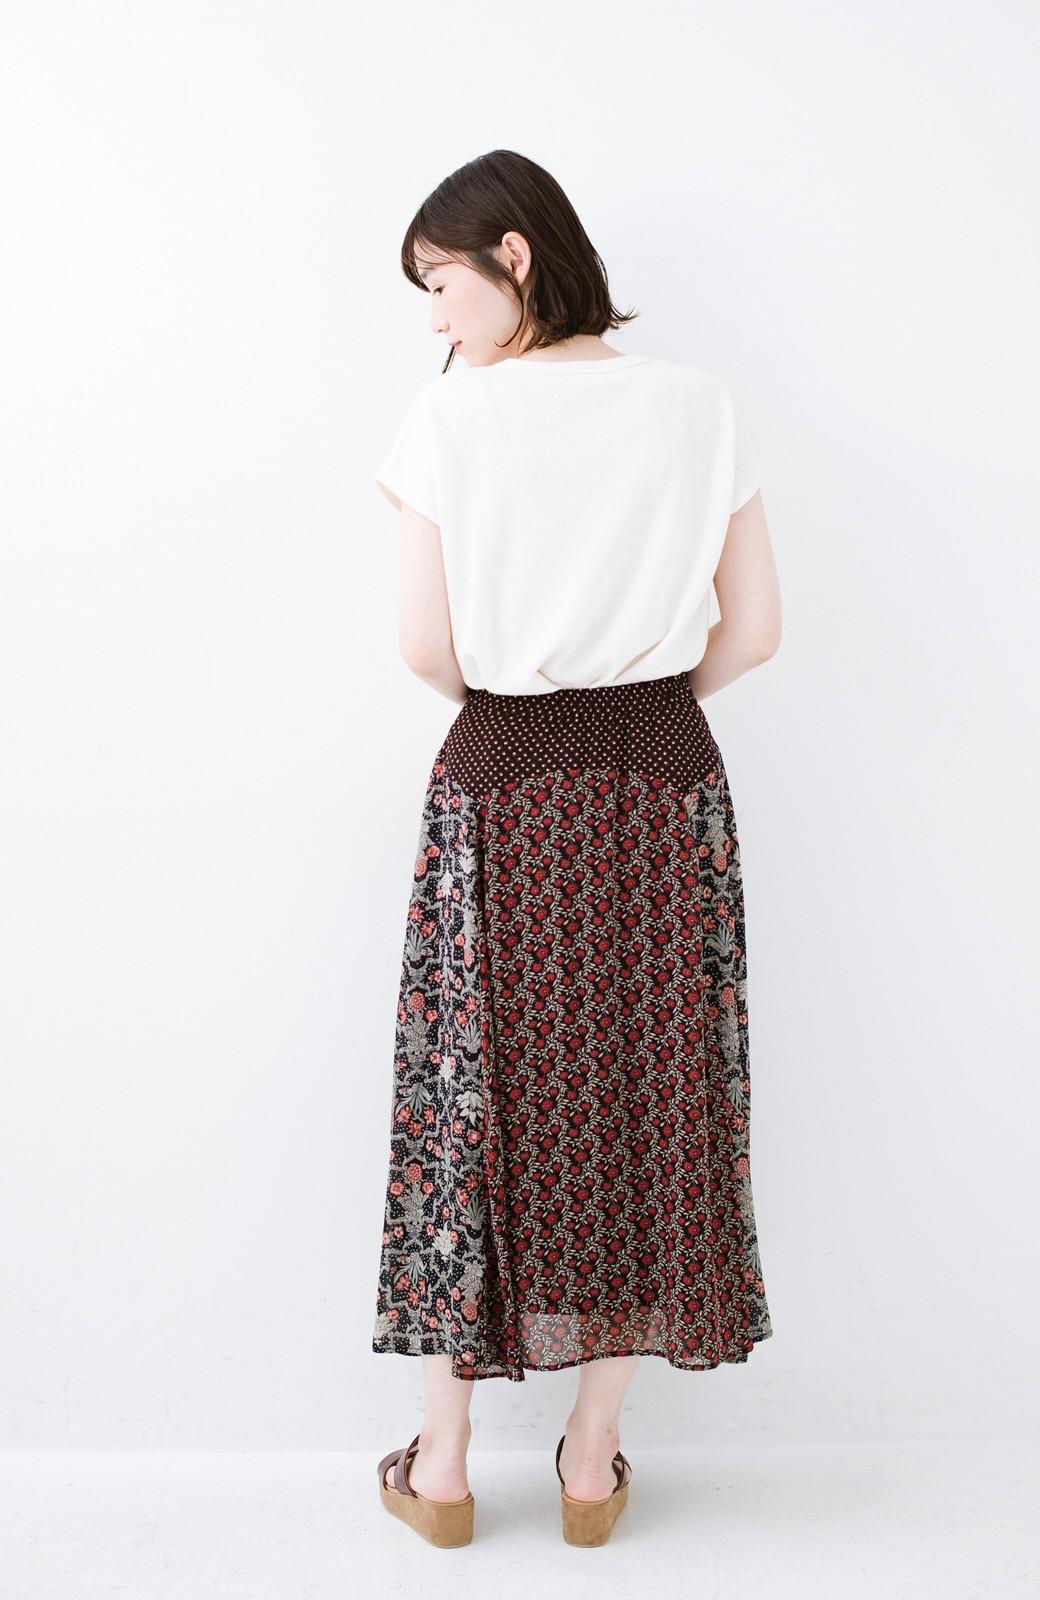 haco! 【洗濯機洗いOK】シンプルなトップスに合わせるだけでかわいくなれる MIX柄スカート <ブラック系その他>の商品写真14